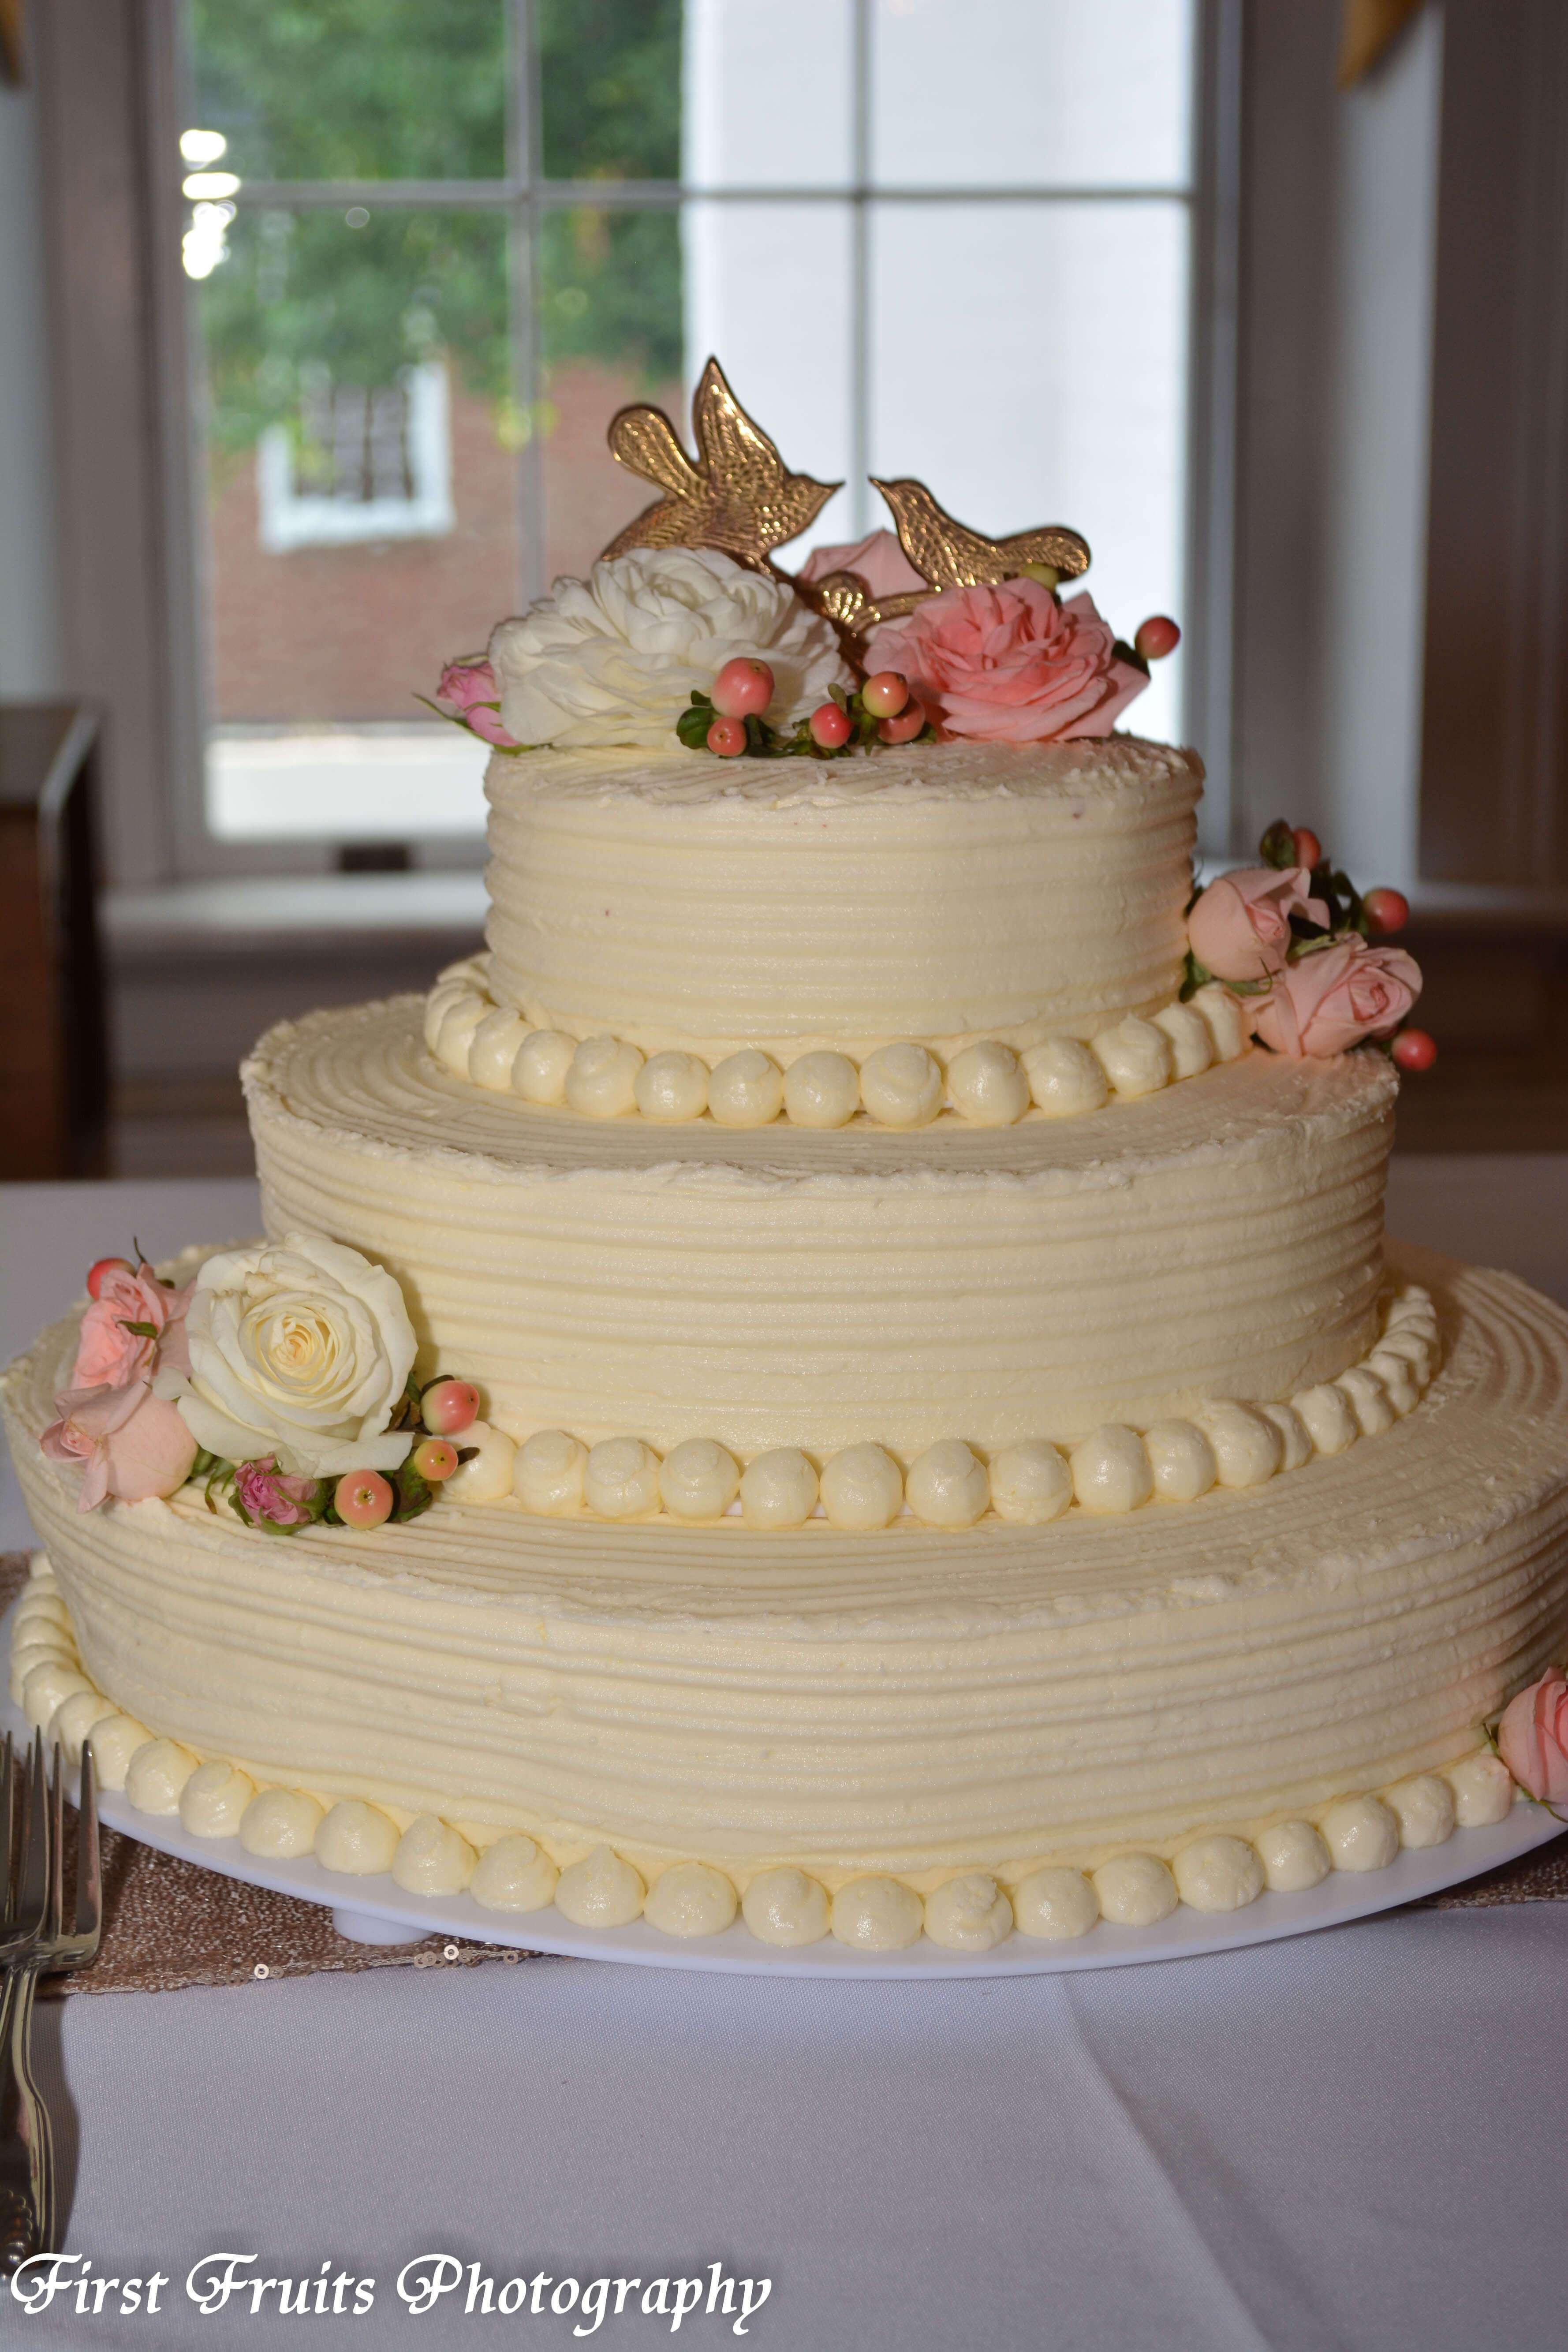 Wedding Cakes Knoxville Tn  Wedding Cakes Gatlinburg Tn